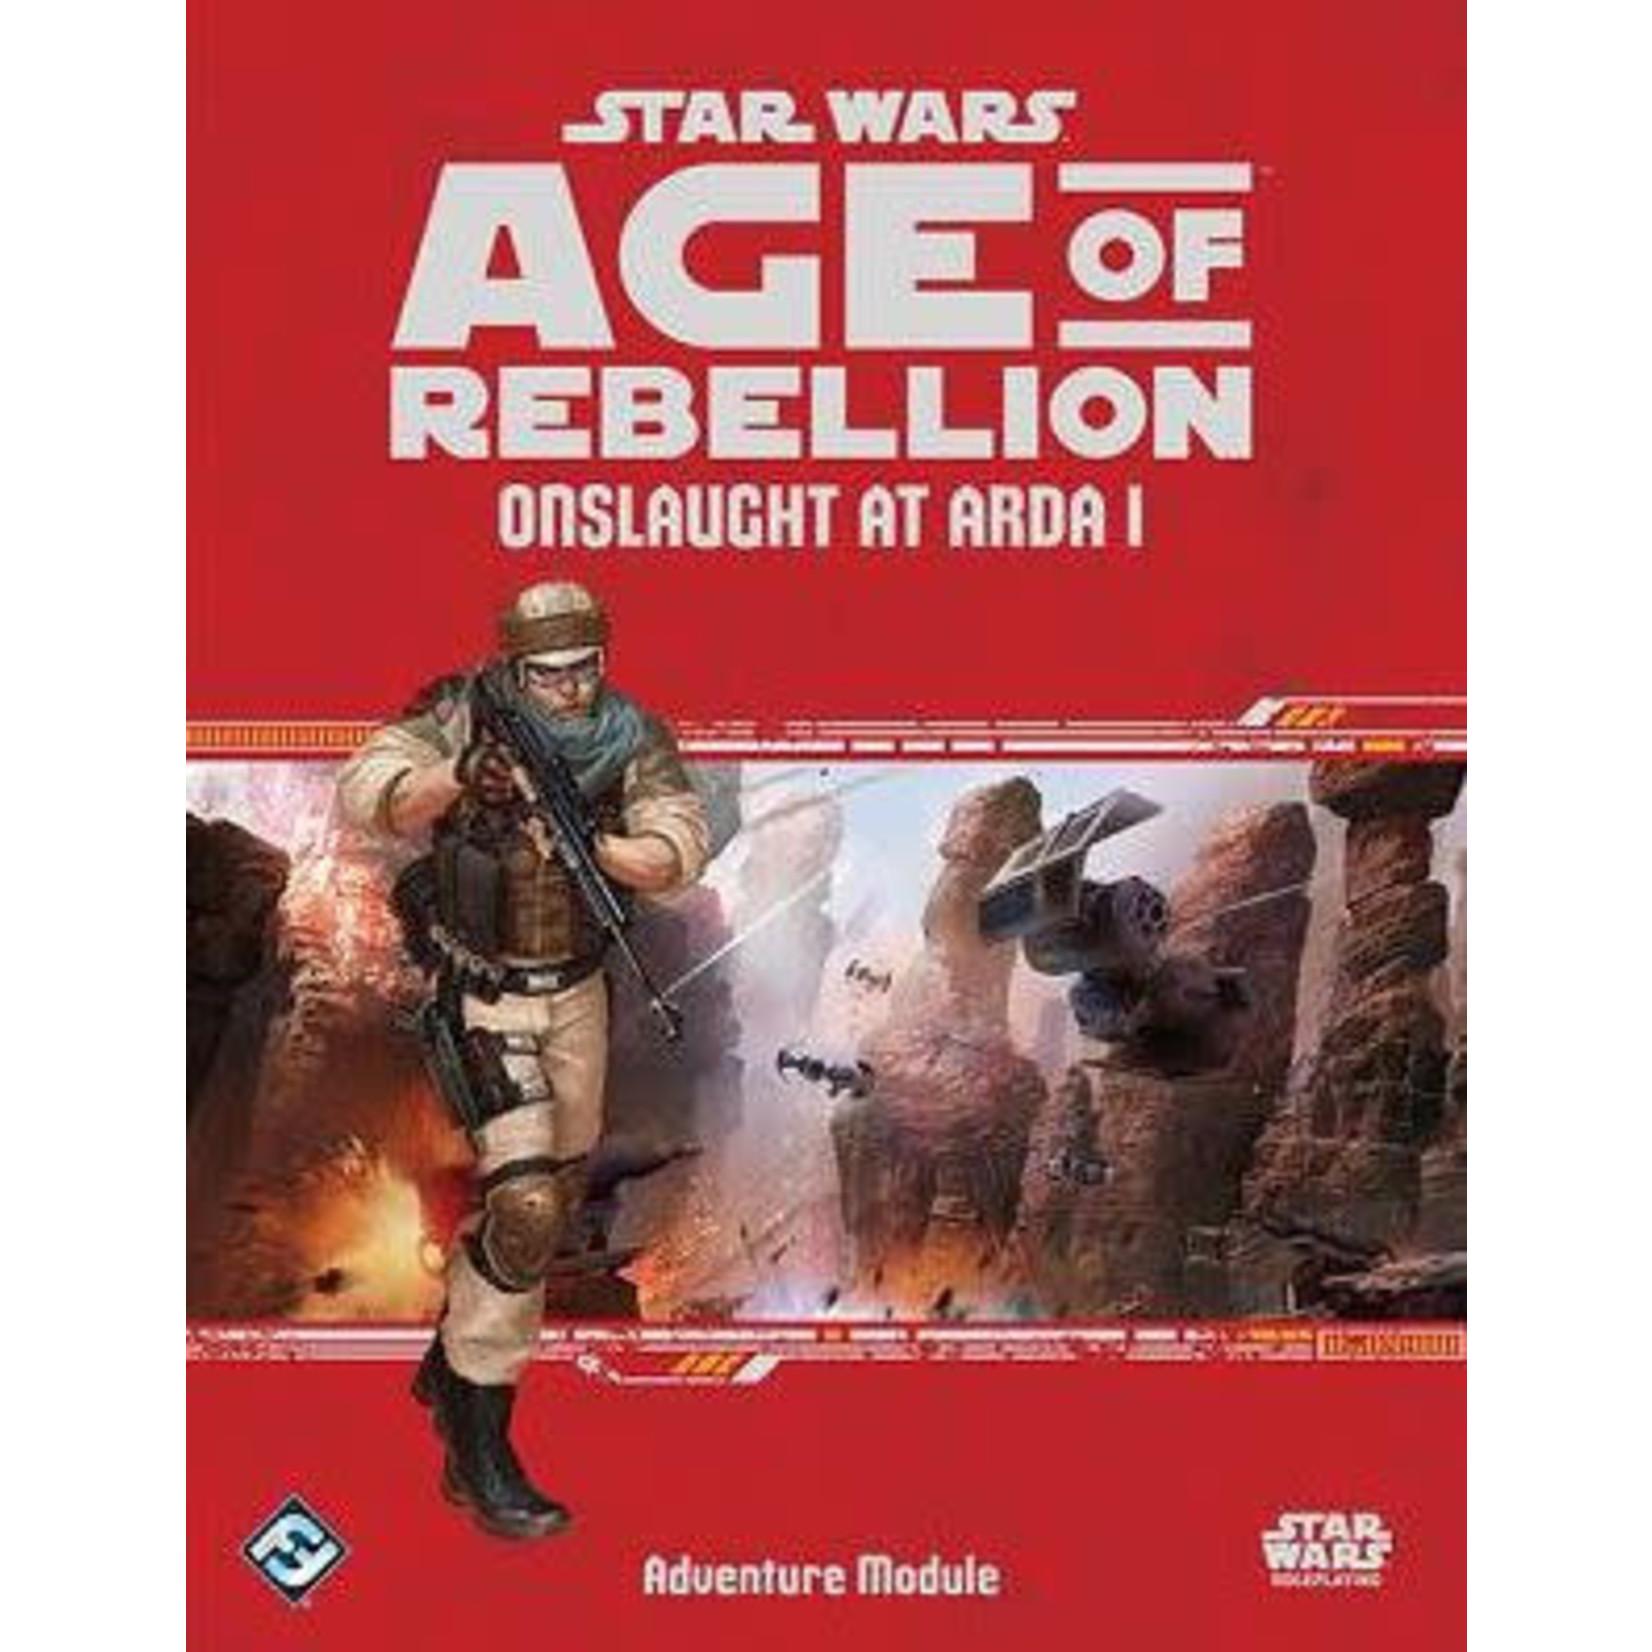 Star Wars Age of Rebellion: Onslaught at Arda I